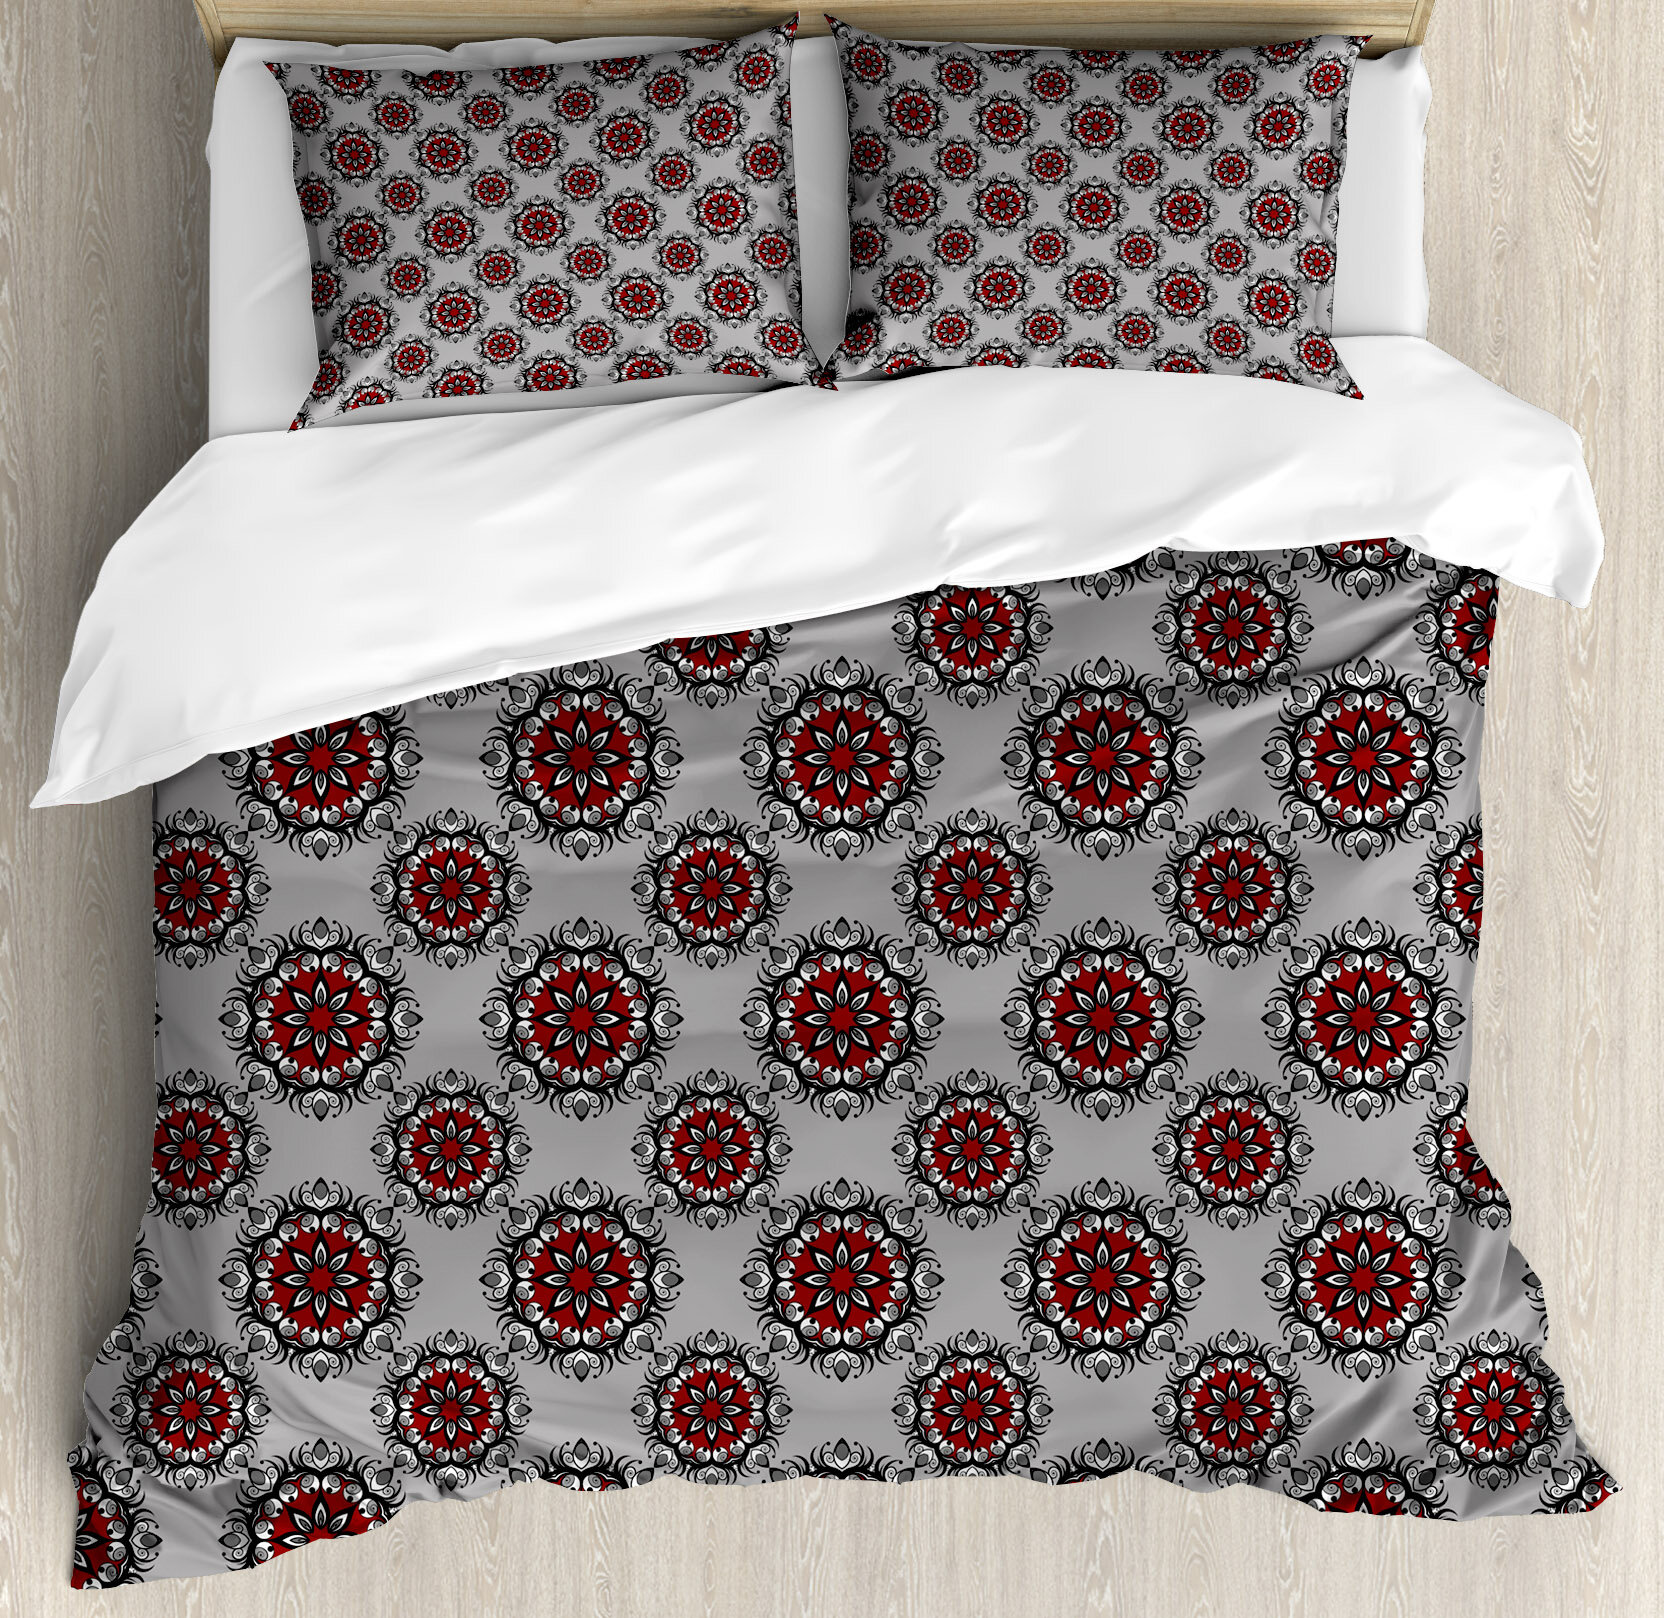 floral bedding set leaf lig soft girls cover white kids pin with duvet flower